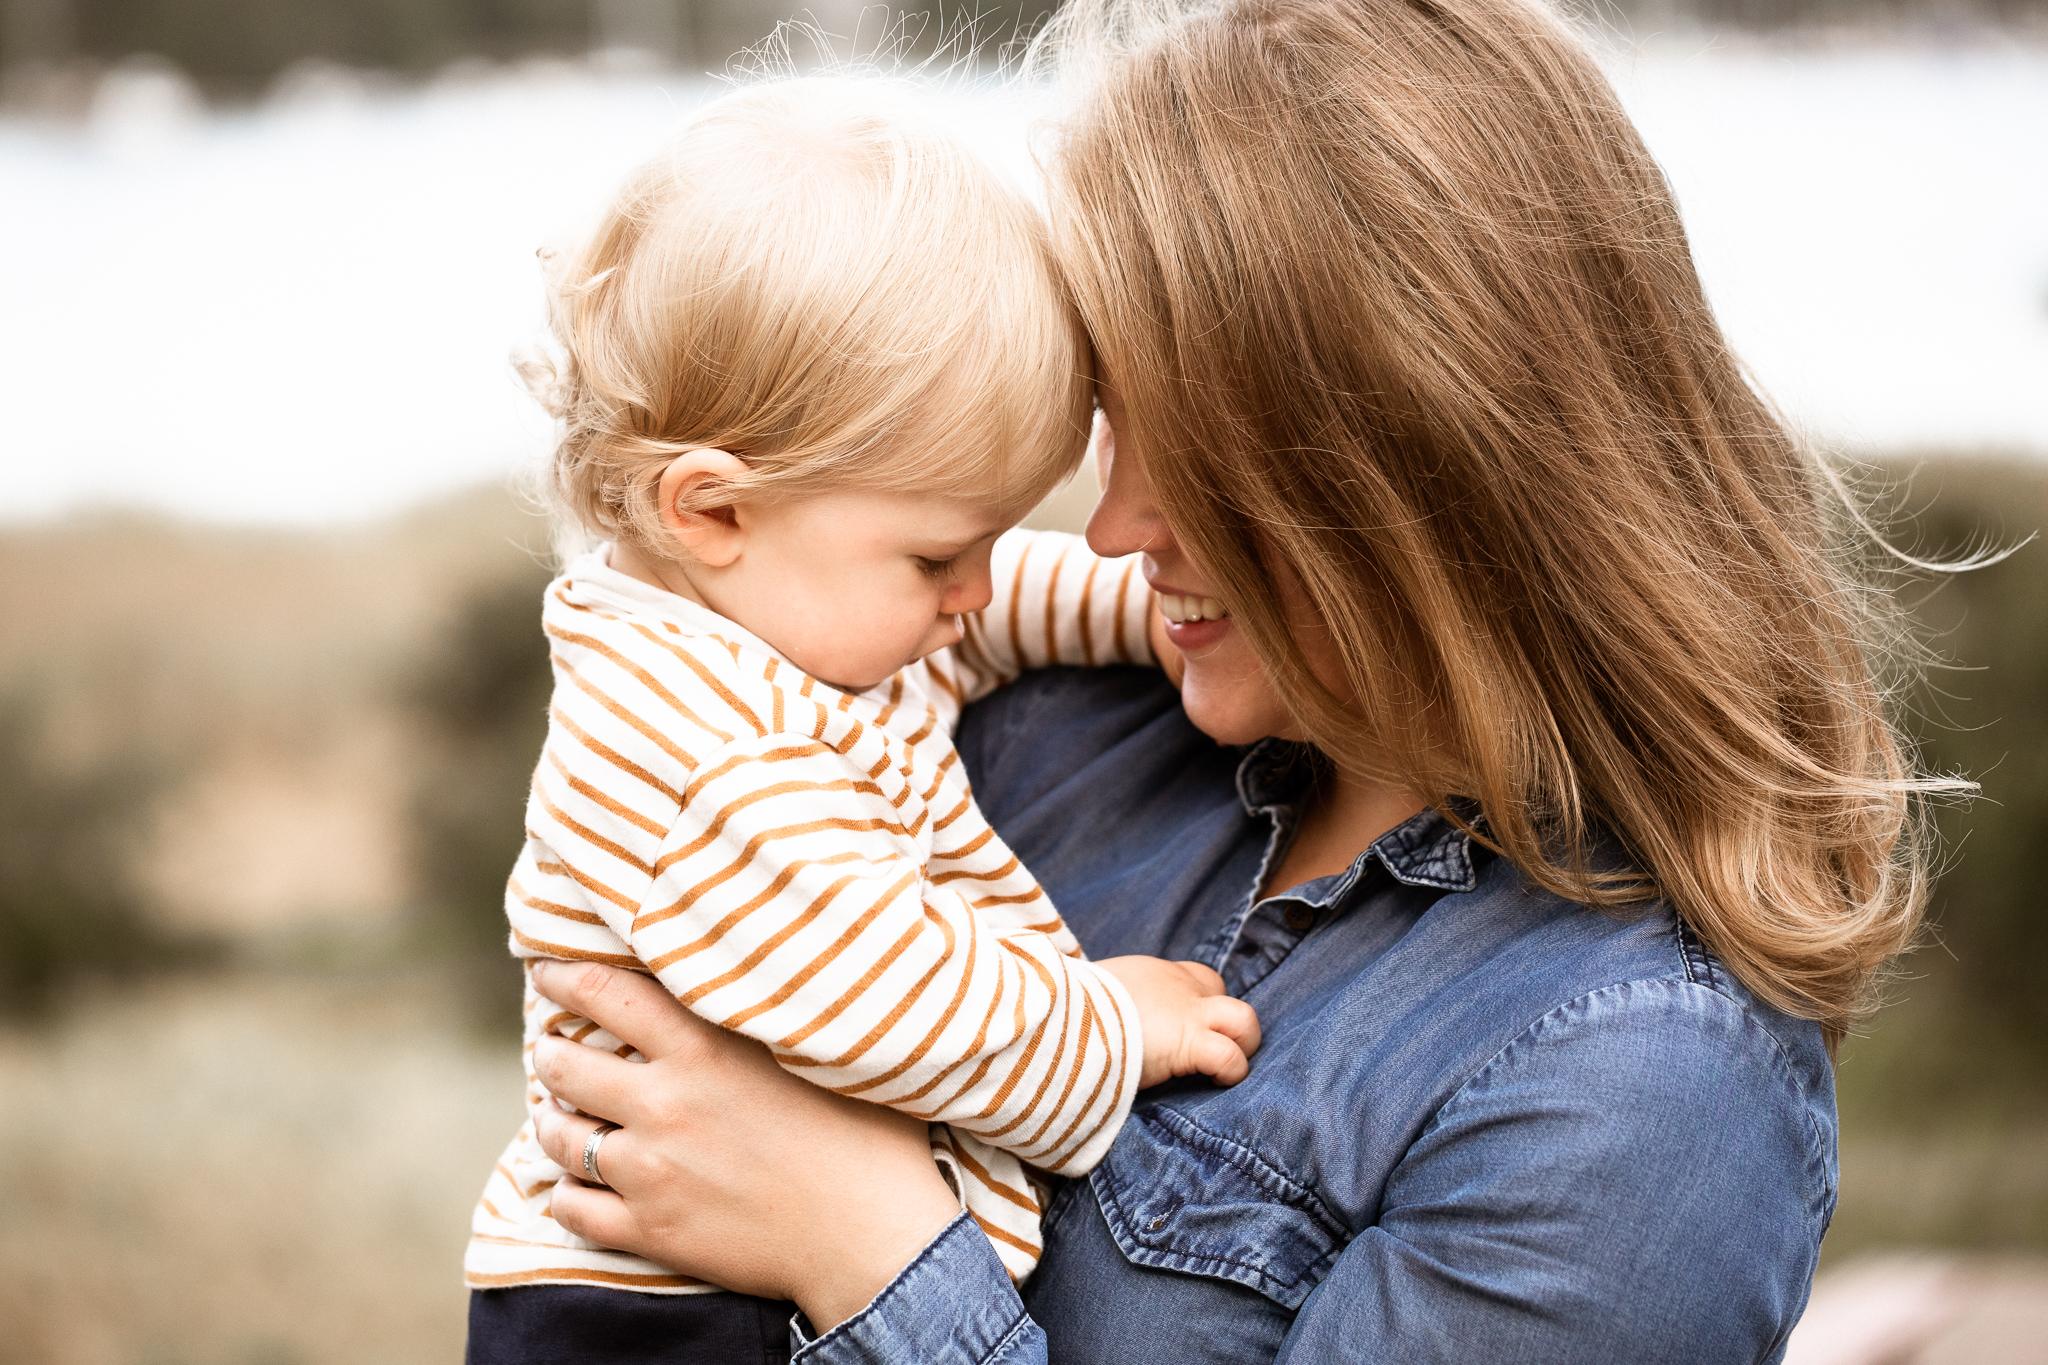 Äiti-lapsikuvaus, lifestyle-perhekuvaus Helsinki, Siru Danielsson Photography